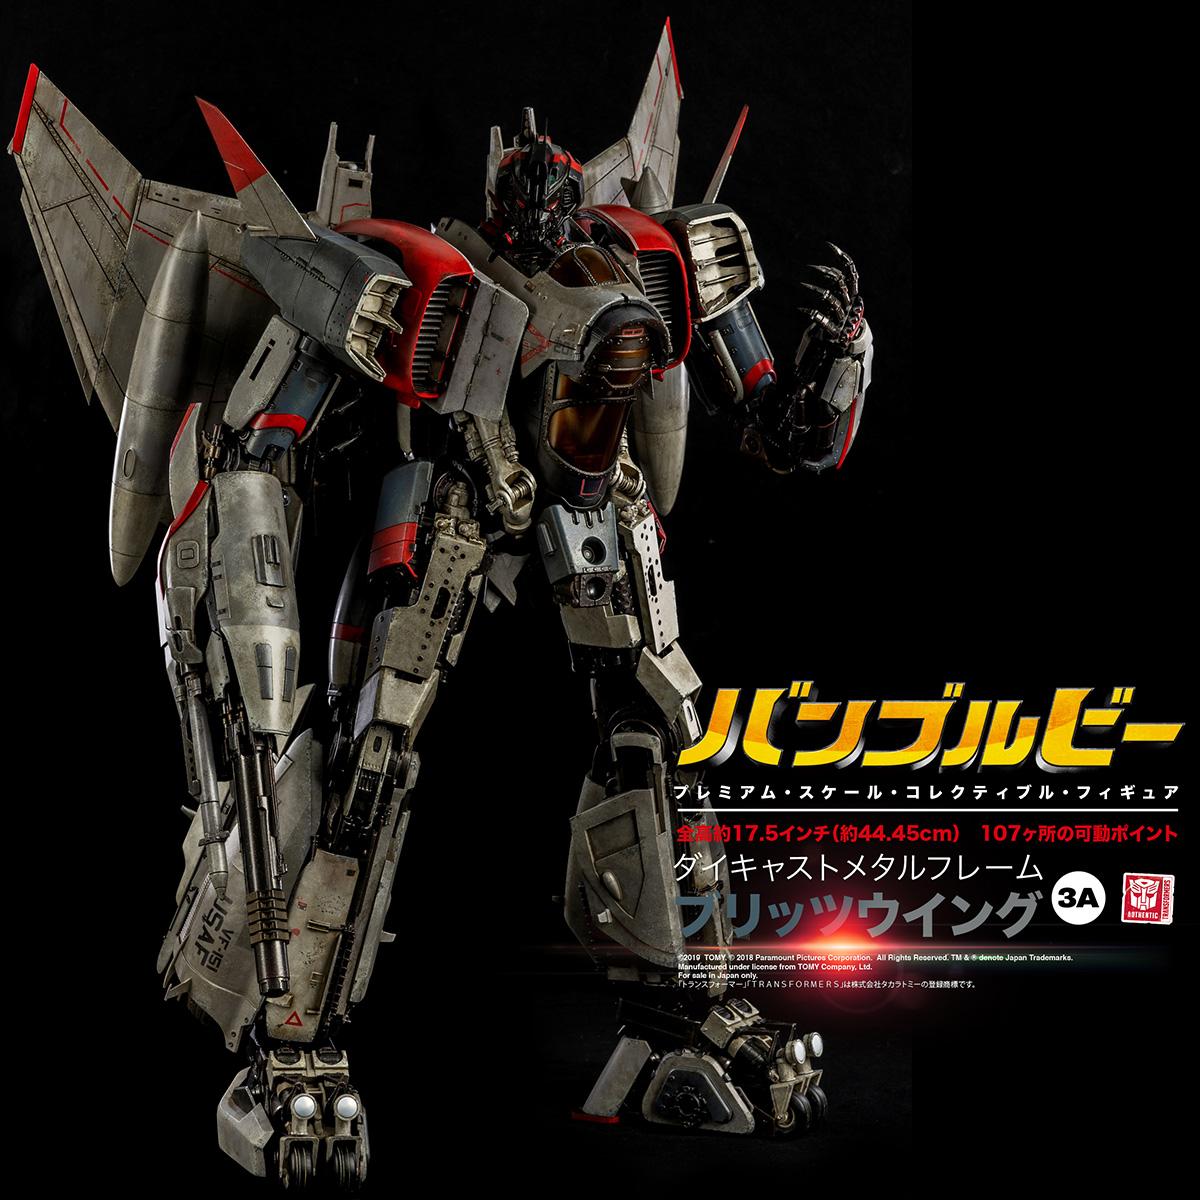 Blitzwing_PM_JAP_1034.jpg